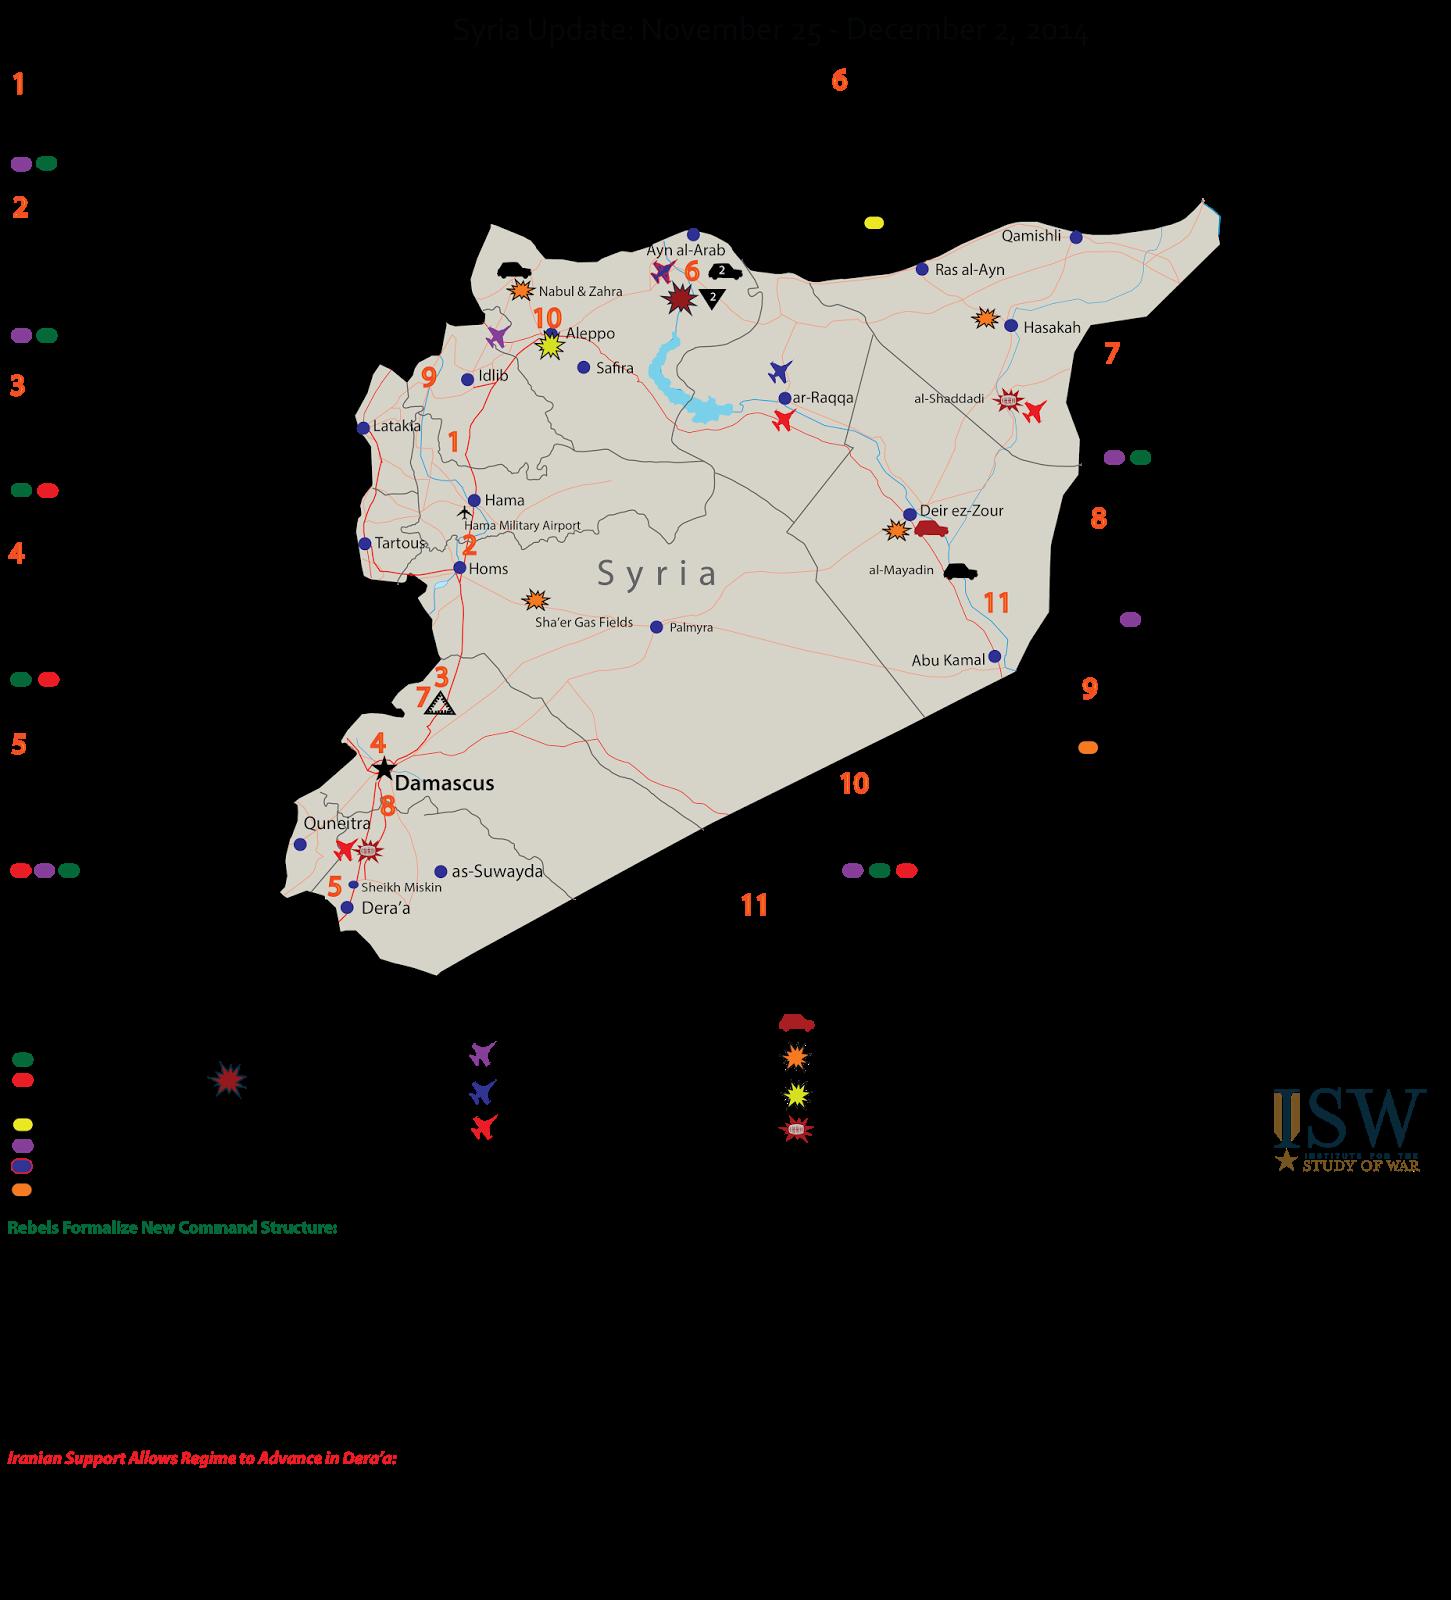 Syria%2BSITREP%2BMAP%2B2014-12-02_HIGH.p